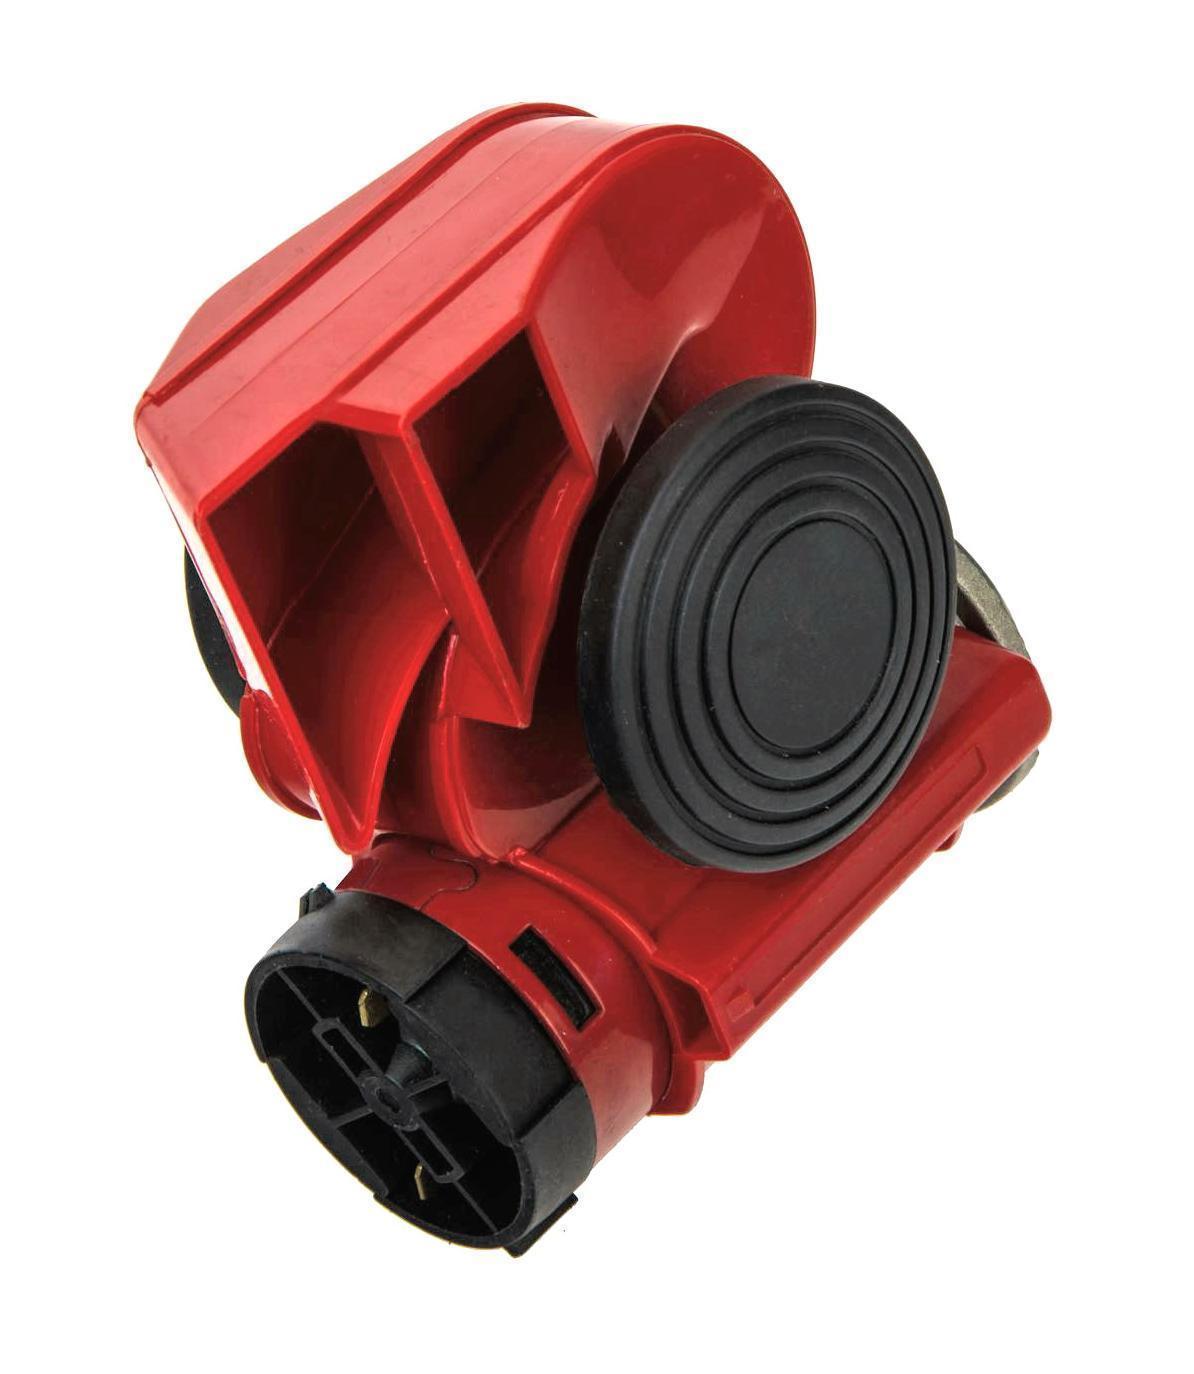 Onpira Malý kompresorový klakson - MOTO fanfára 12V, 139 dB